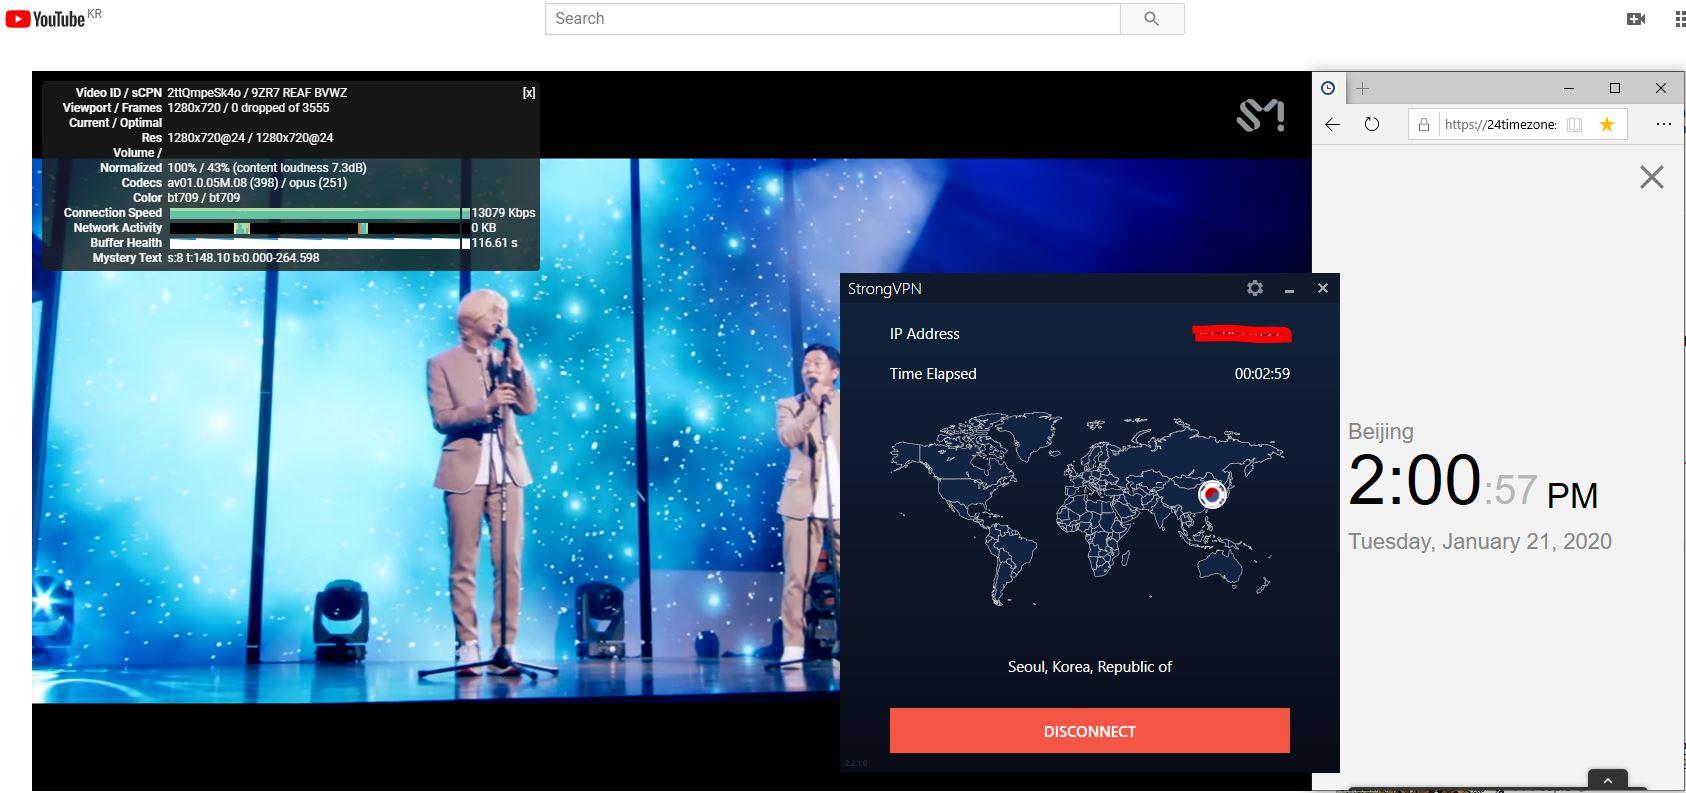 Windows10 StrongVPN Korea 中国VPN翻墙 科学上网 Youtube测速-20200121